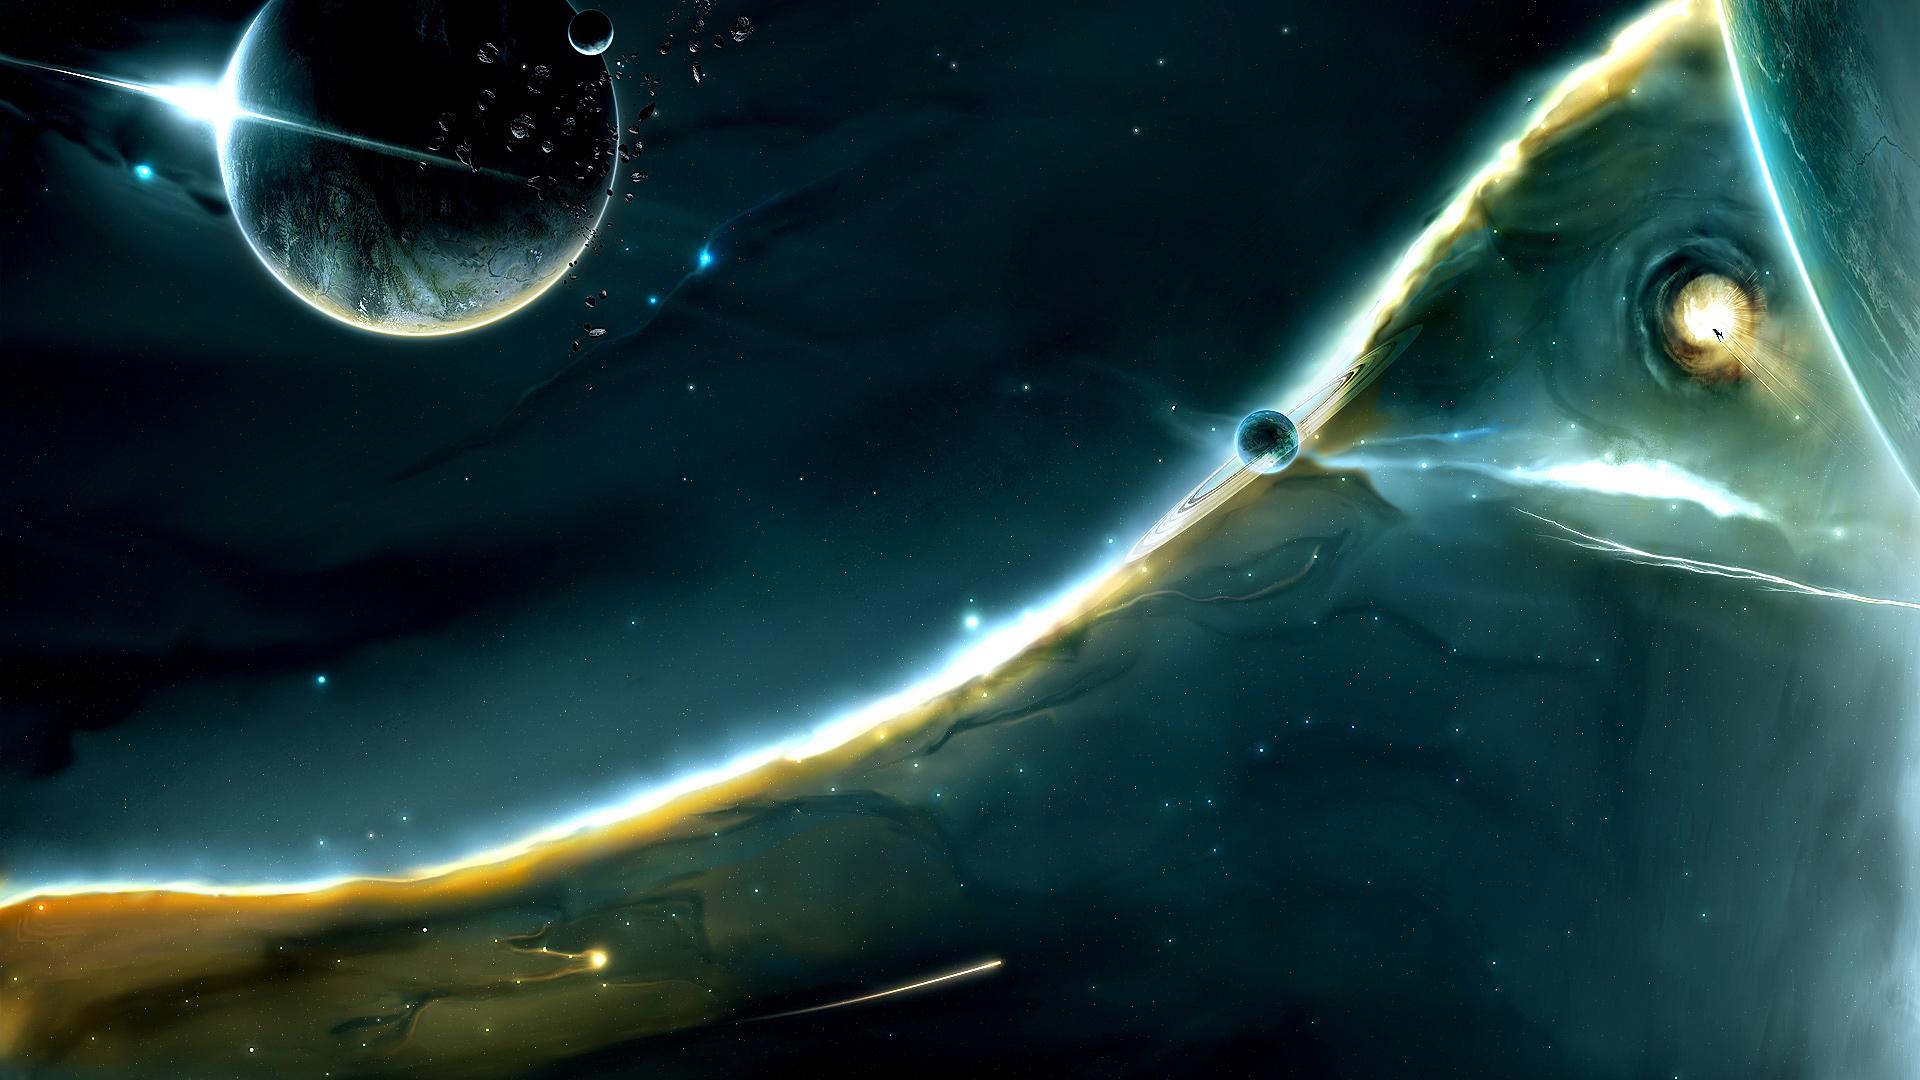 Space wallpaper Full HD – Star, Planet, Sci-Fi